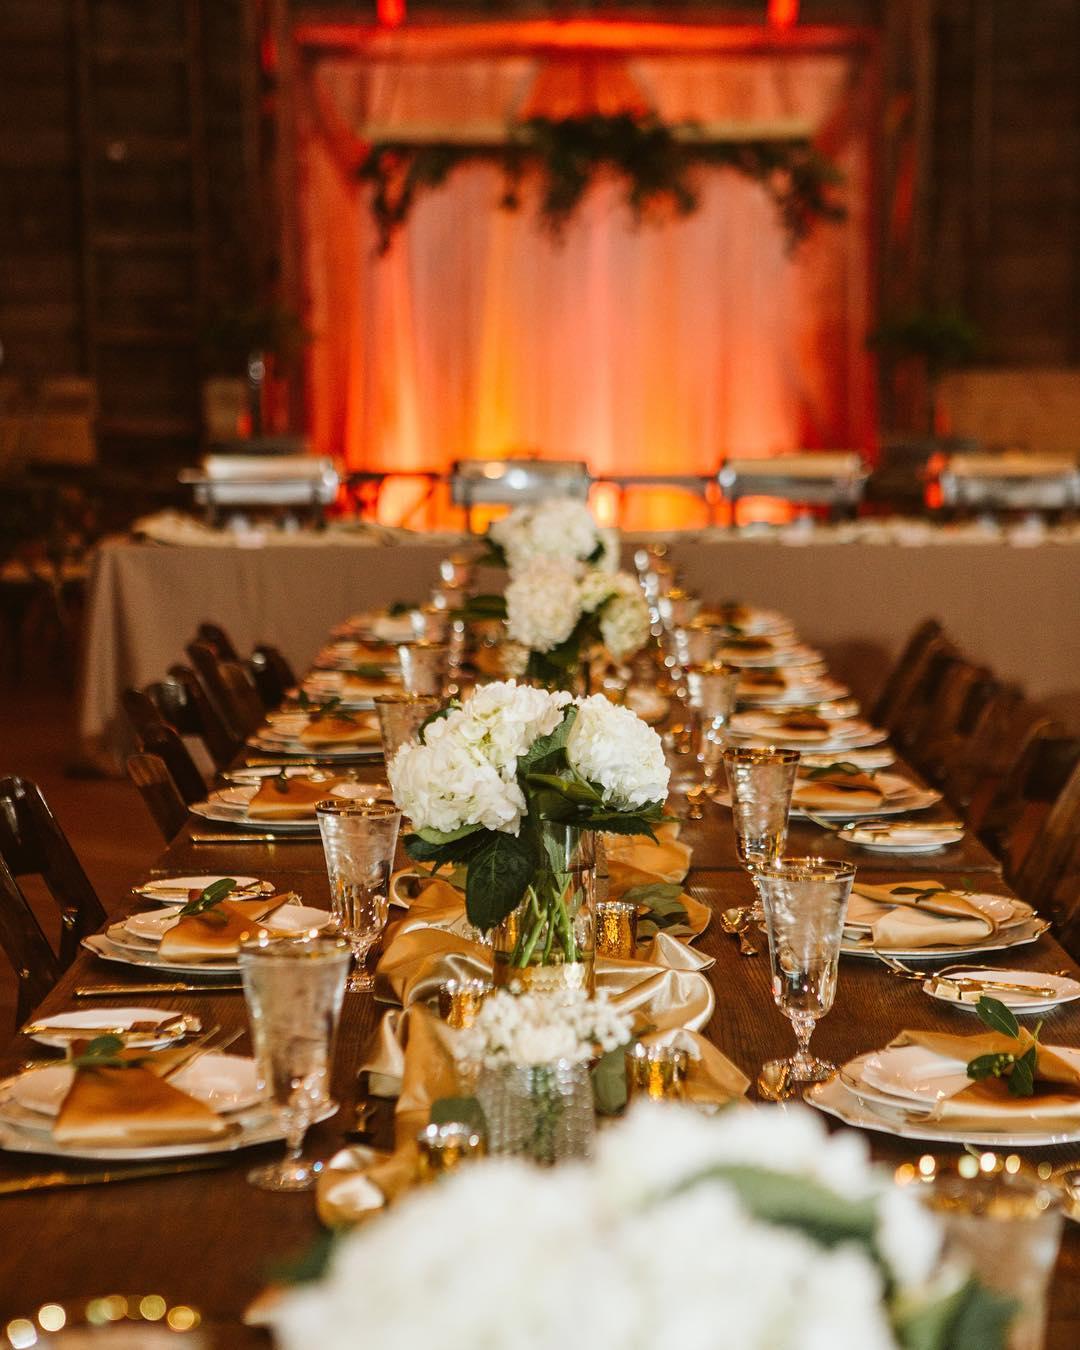 53352472 2194090450652893 8095016551180140544 n Wedding Venue Open House Snohomish